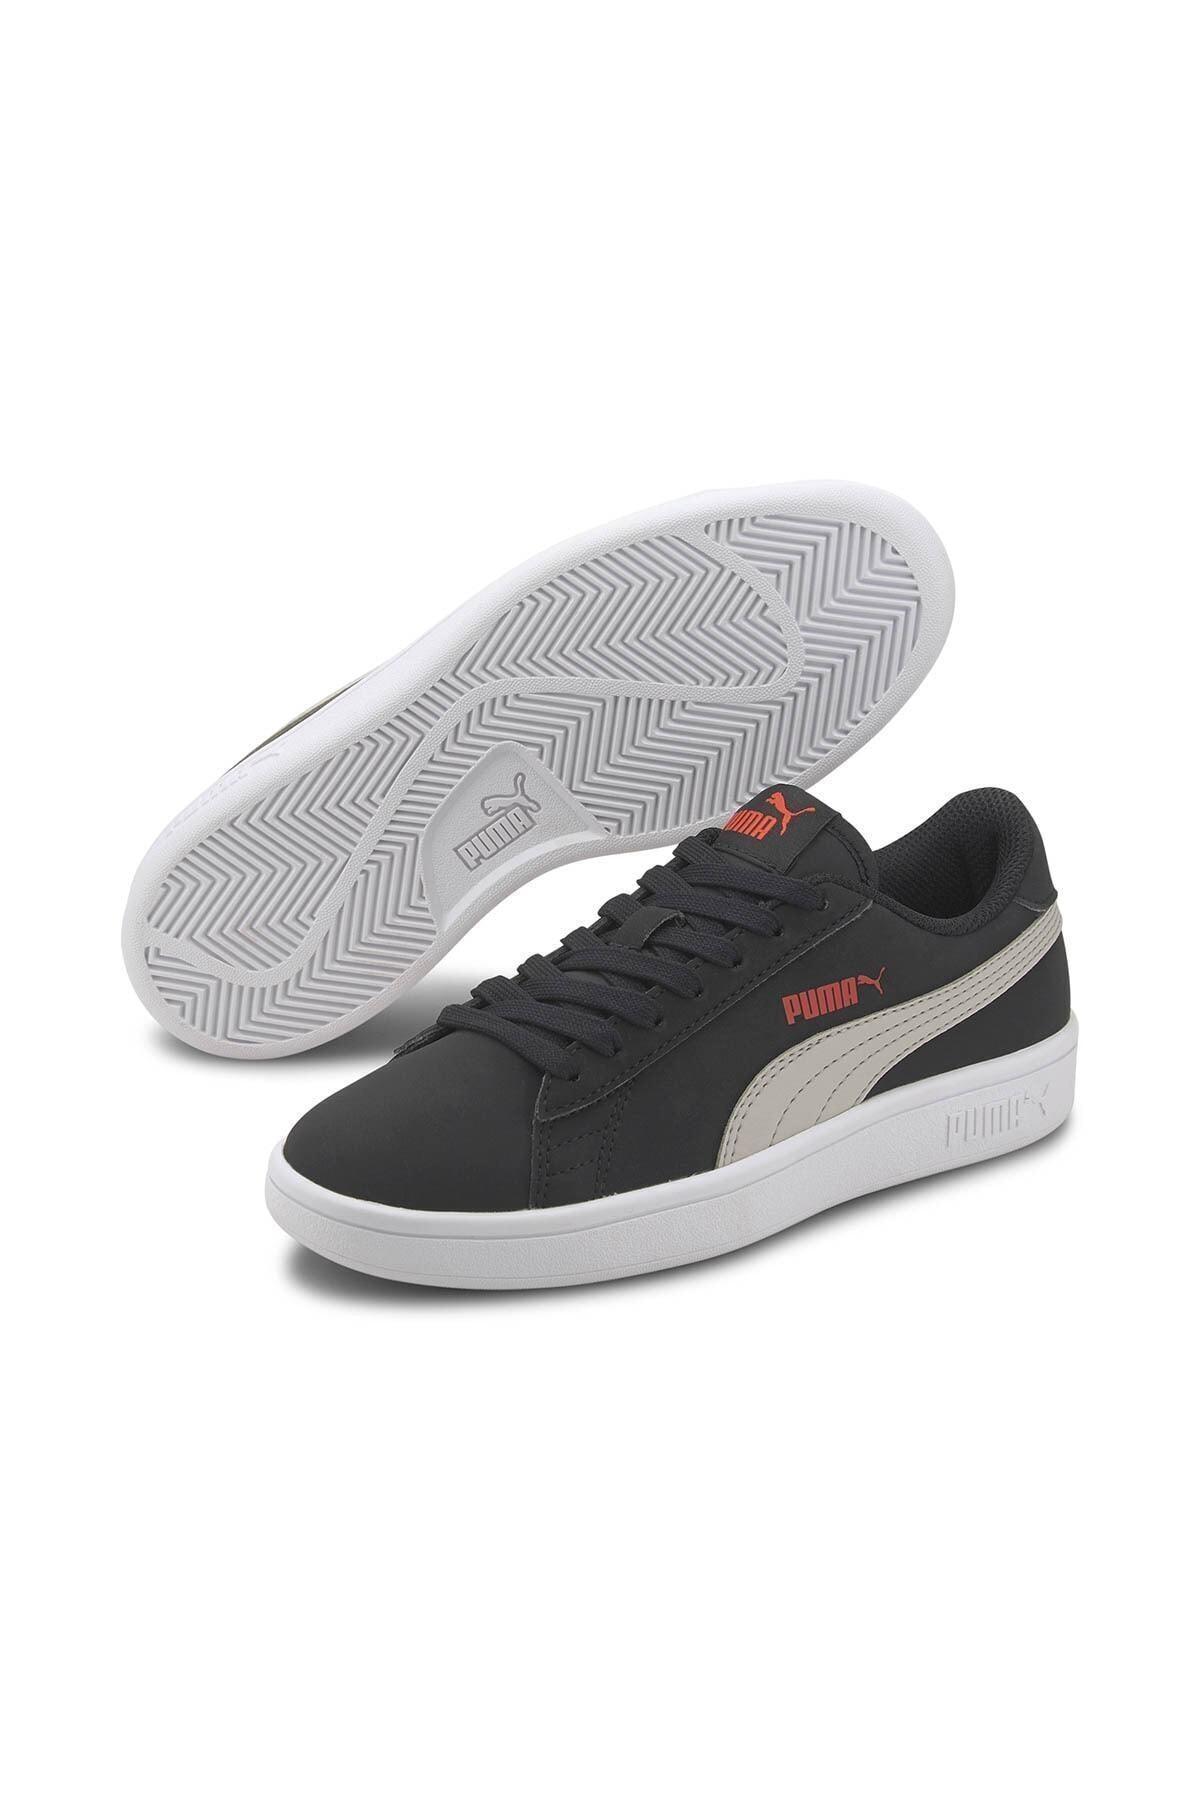 Puma Kadın Sneaker - Smash V2 Buck Jr - 36518219 1